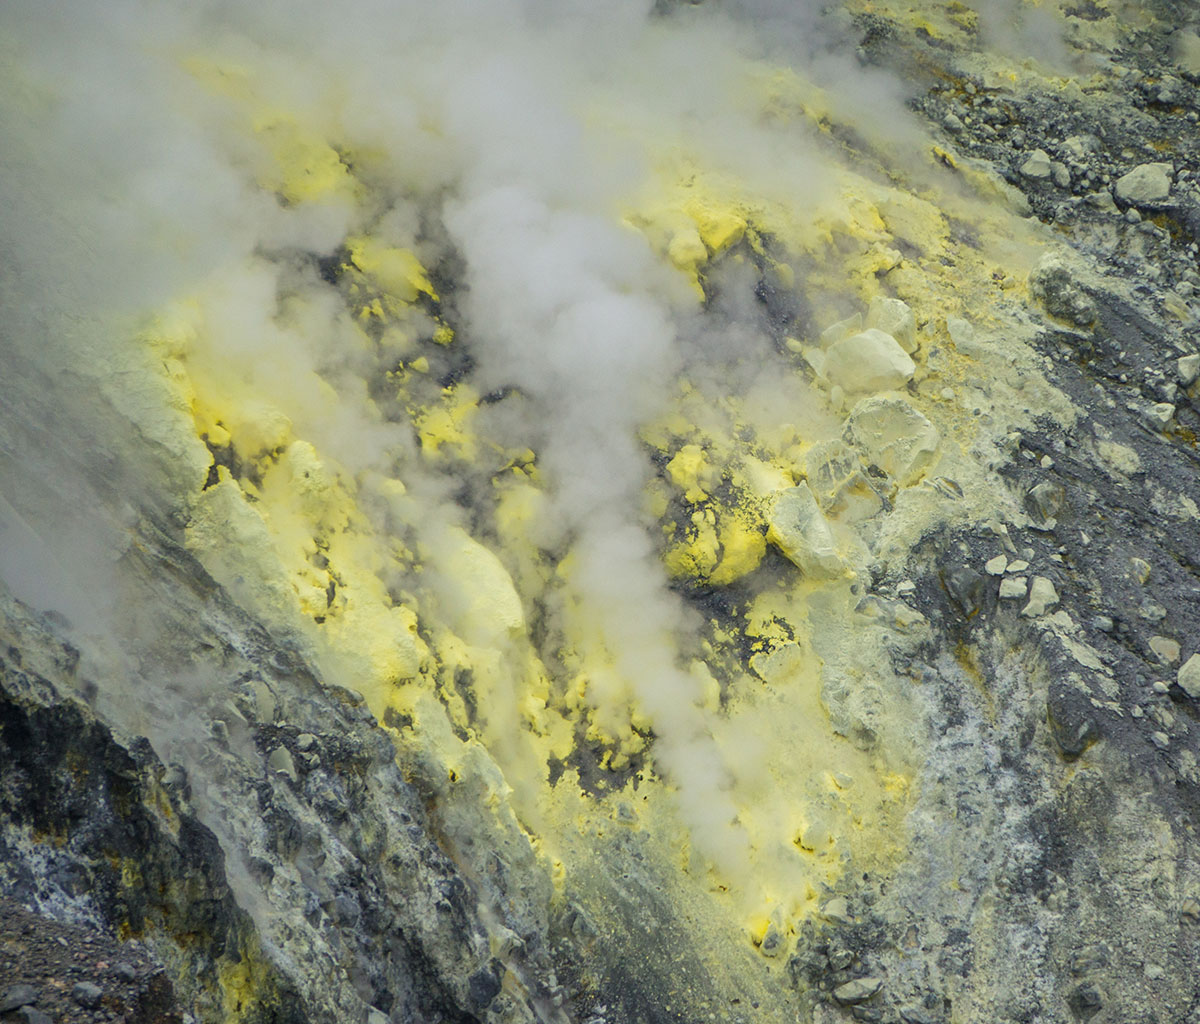 Crater of Mt. Lokon, Manado, Indonesia